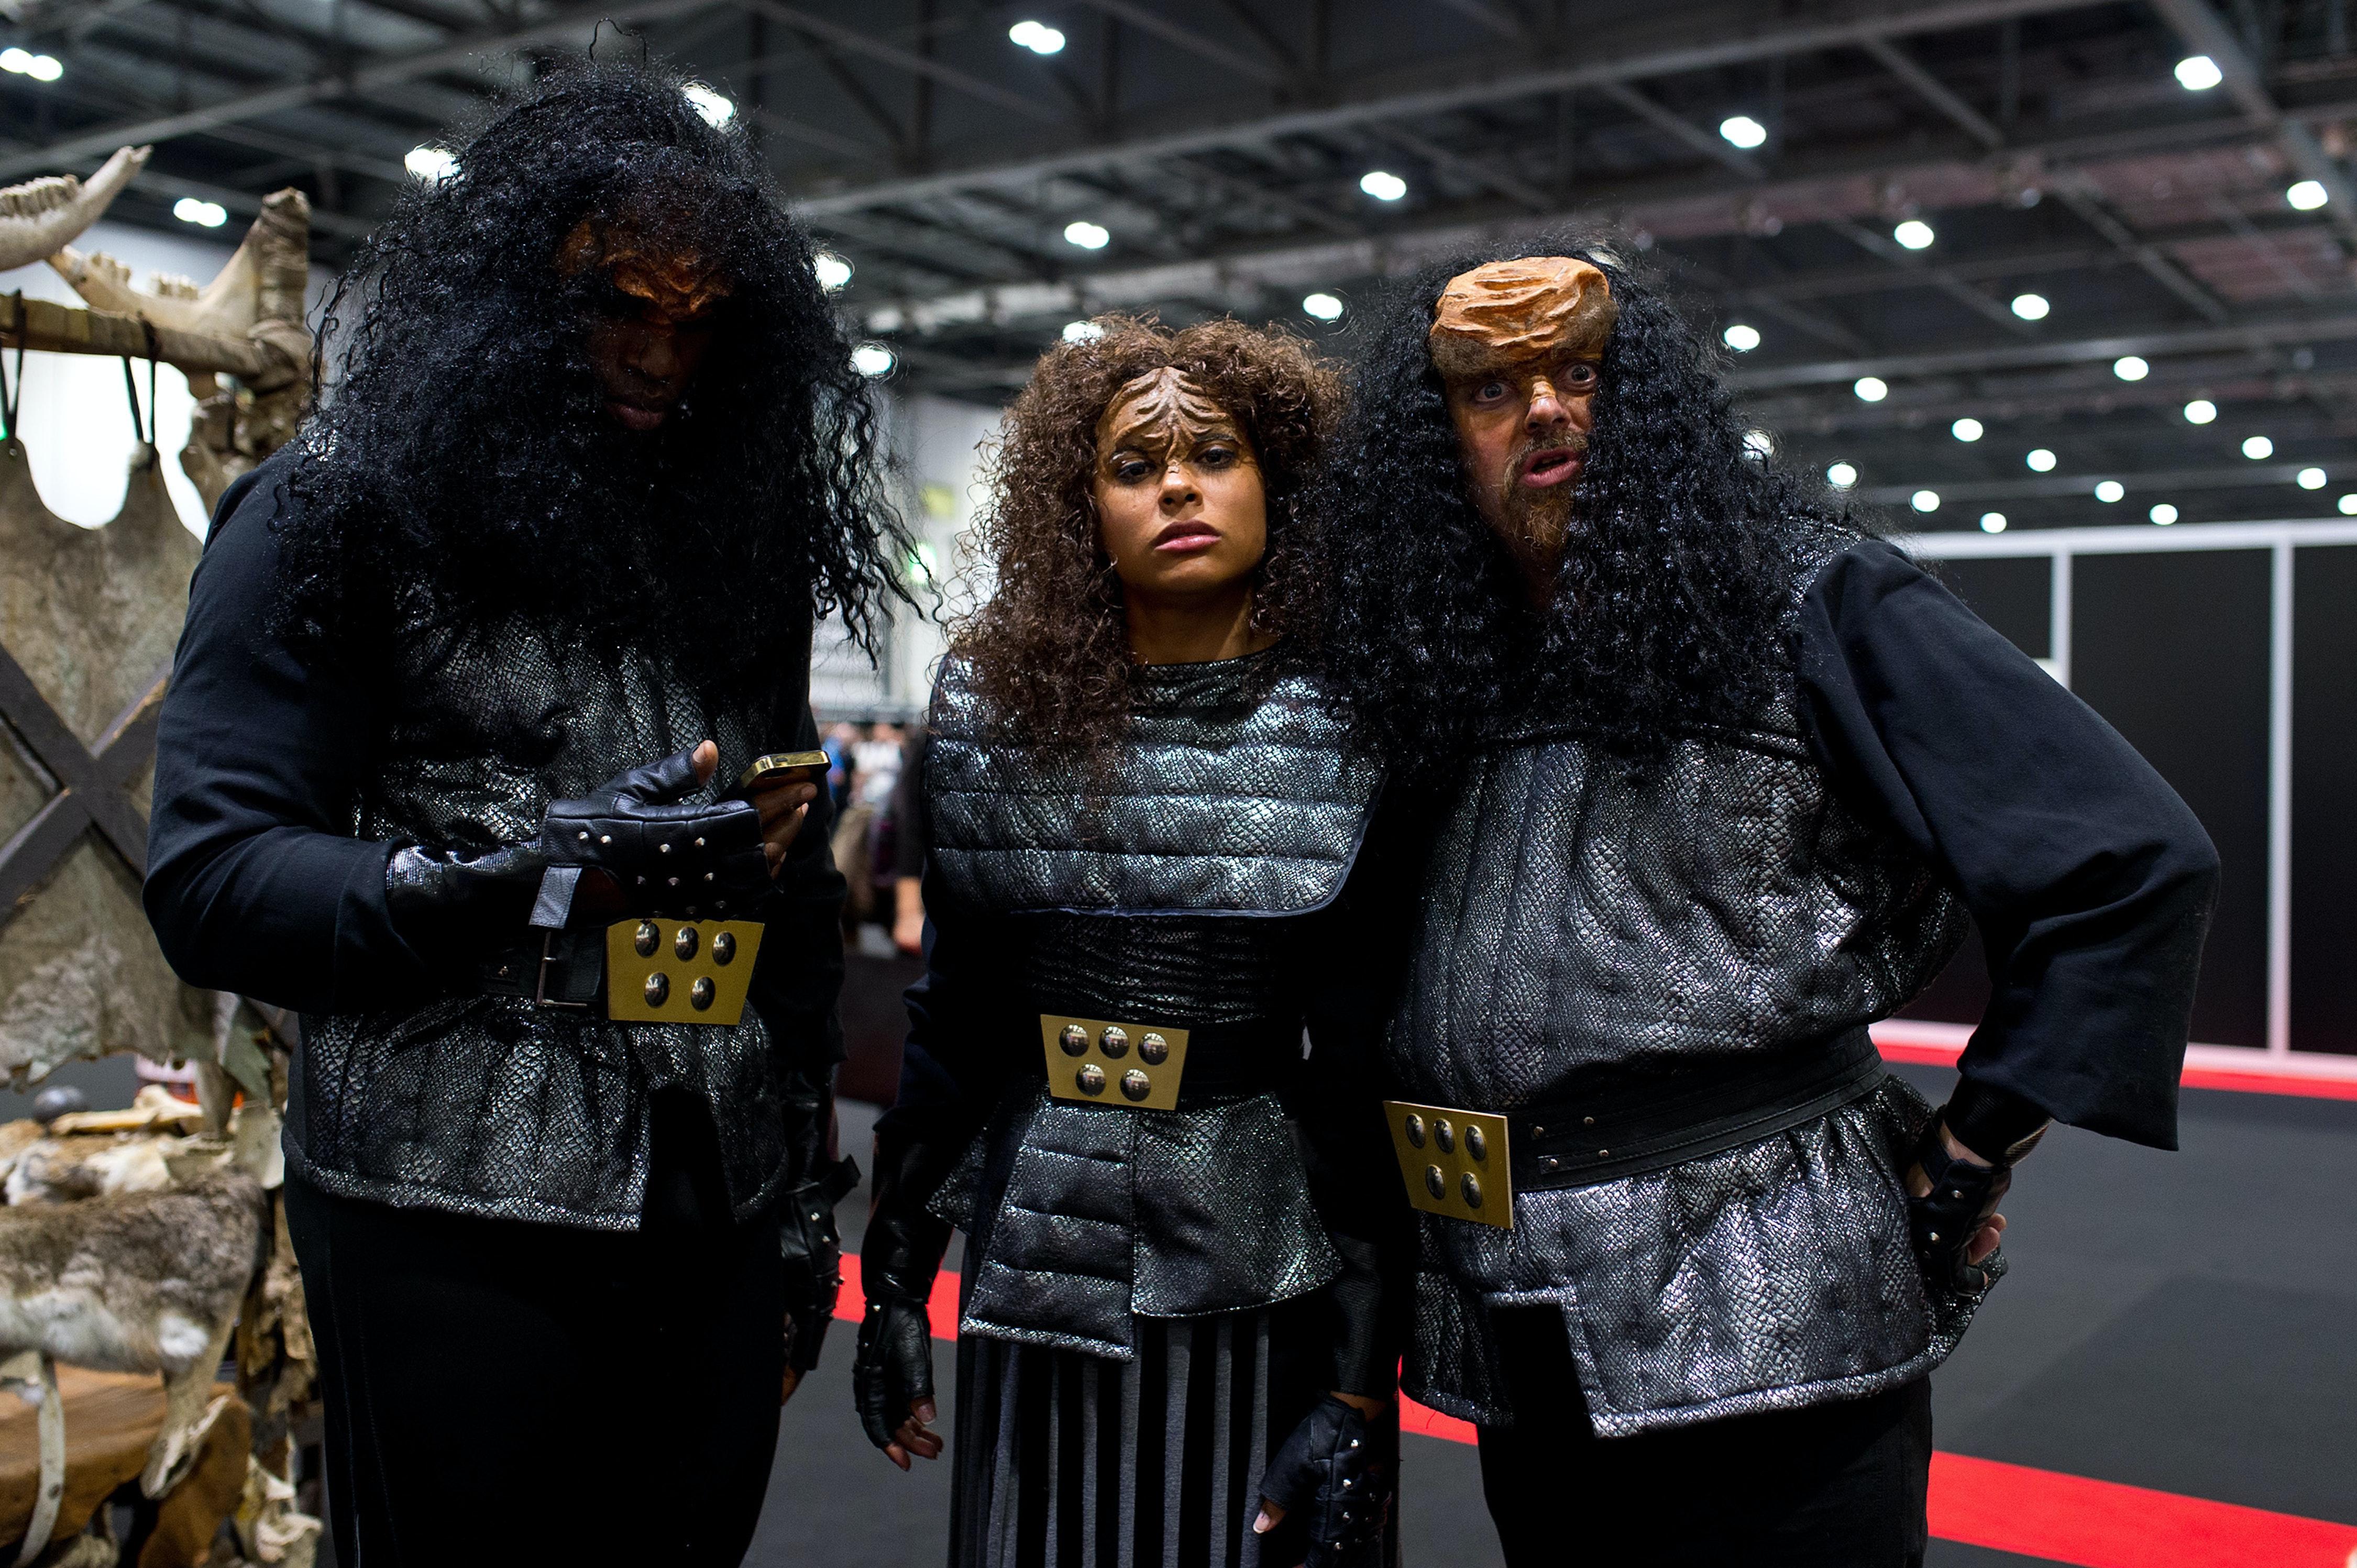 Star Trek Fans Dressed as Klingons